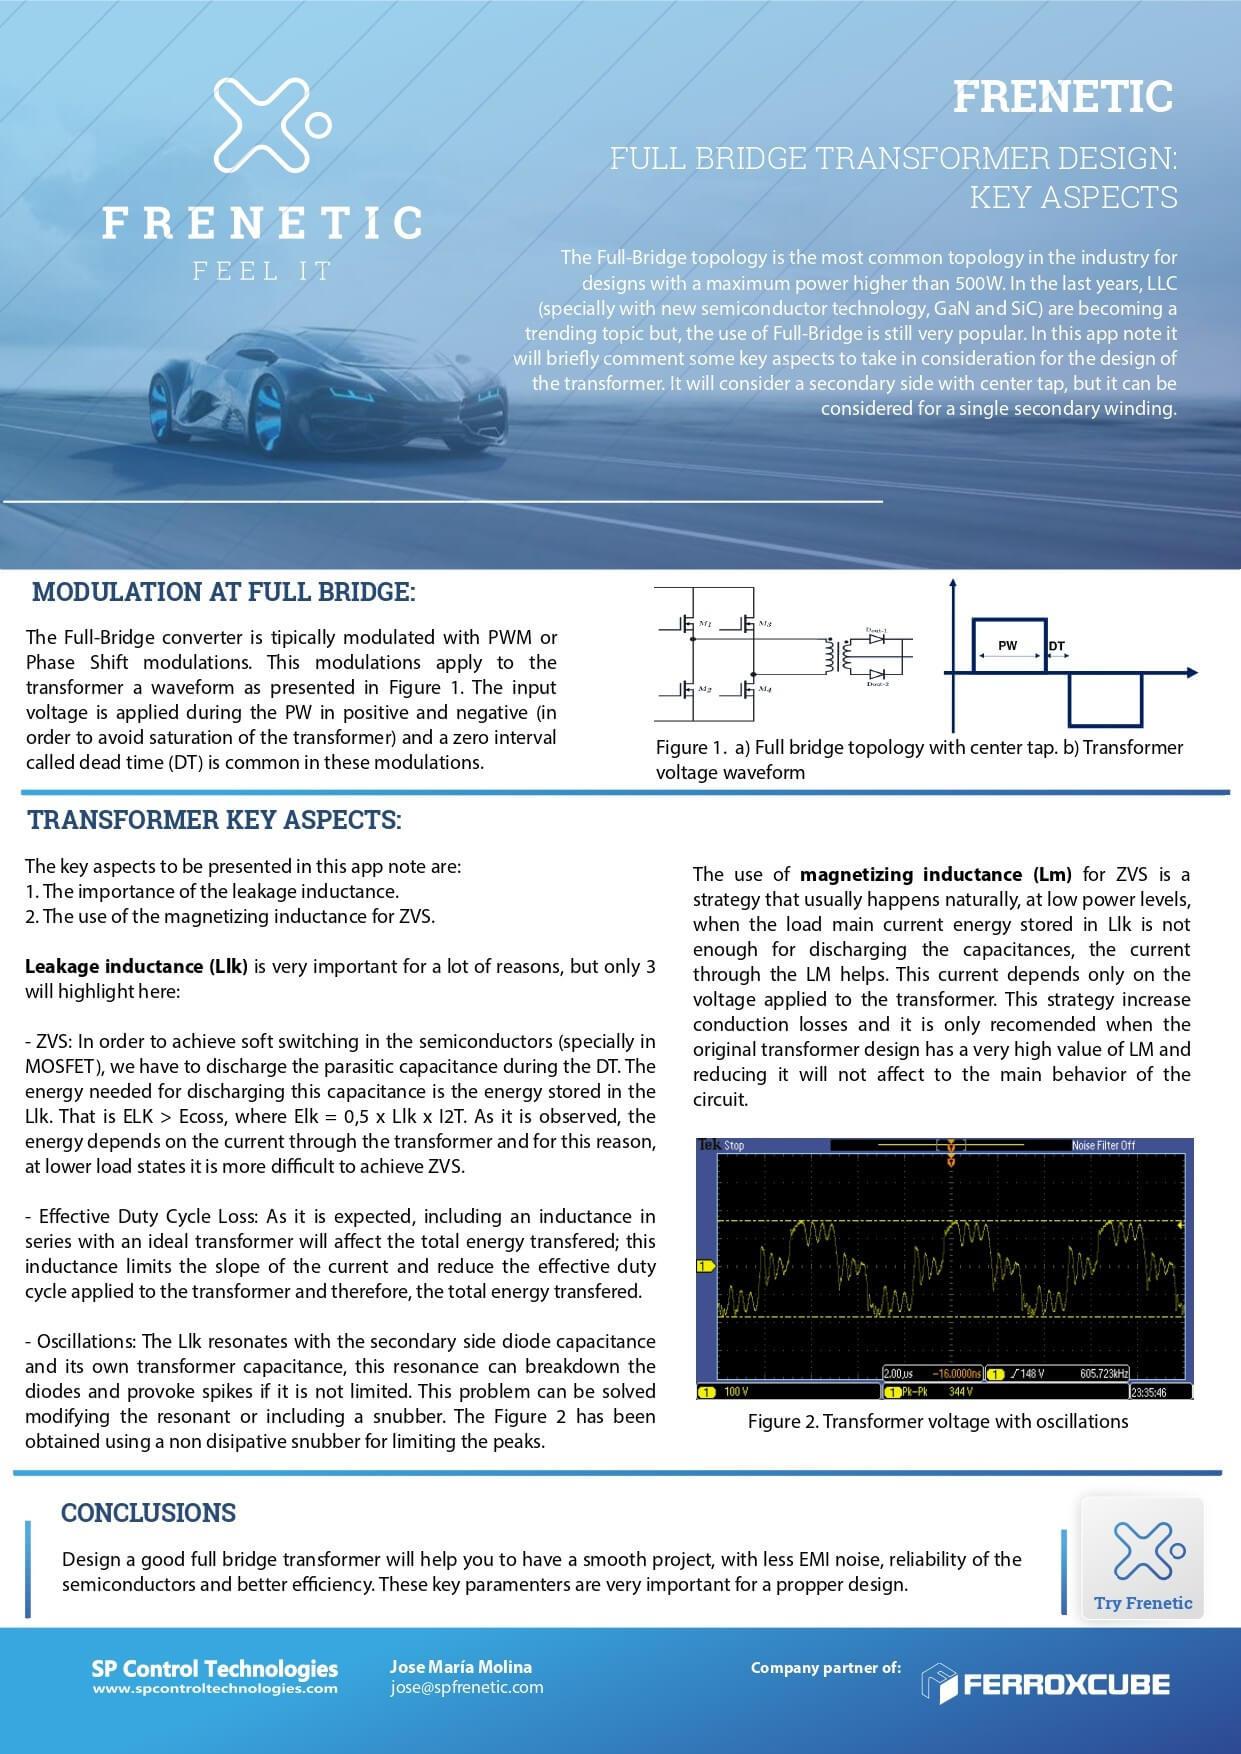 FULL BRIDGE TRANSFORMER DESIGN: KEY ASPECTS